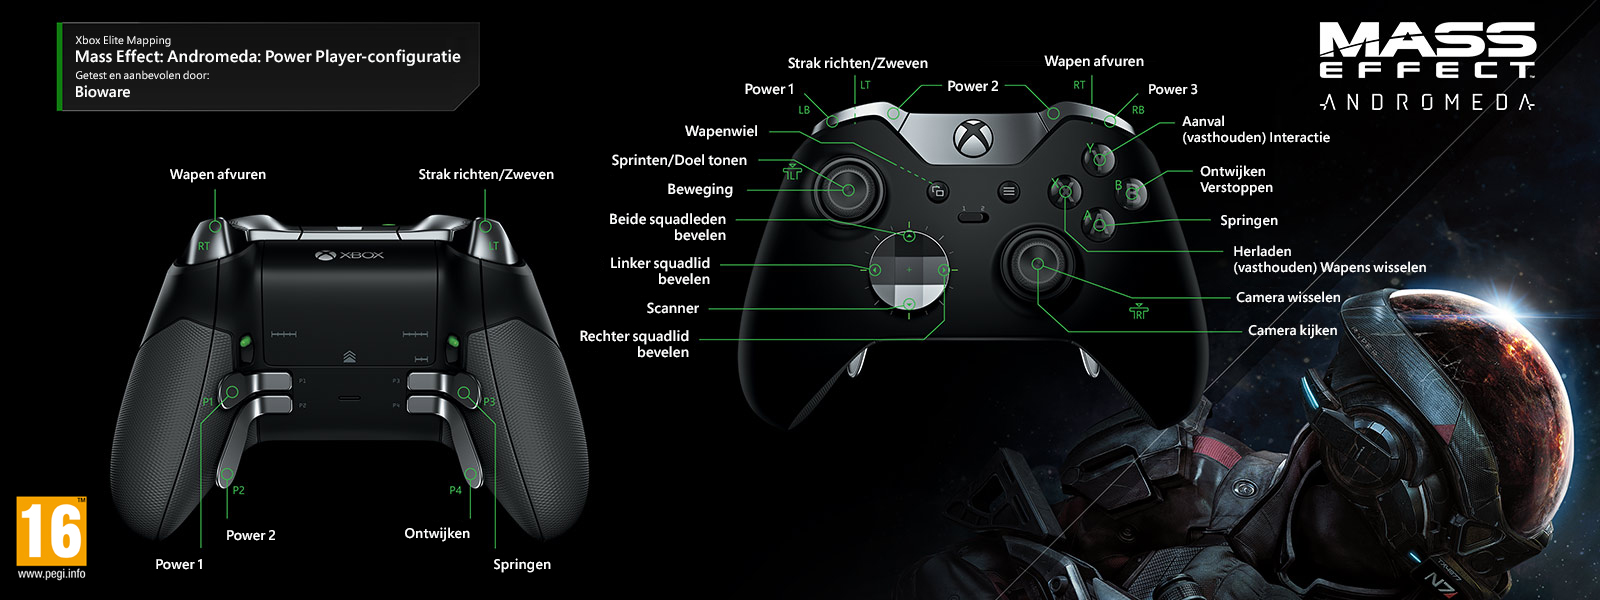 Mass Effect: Andromeda - Power Player-configuratie